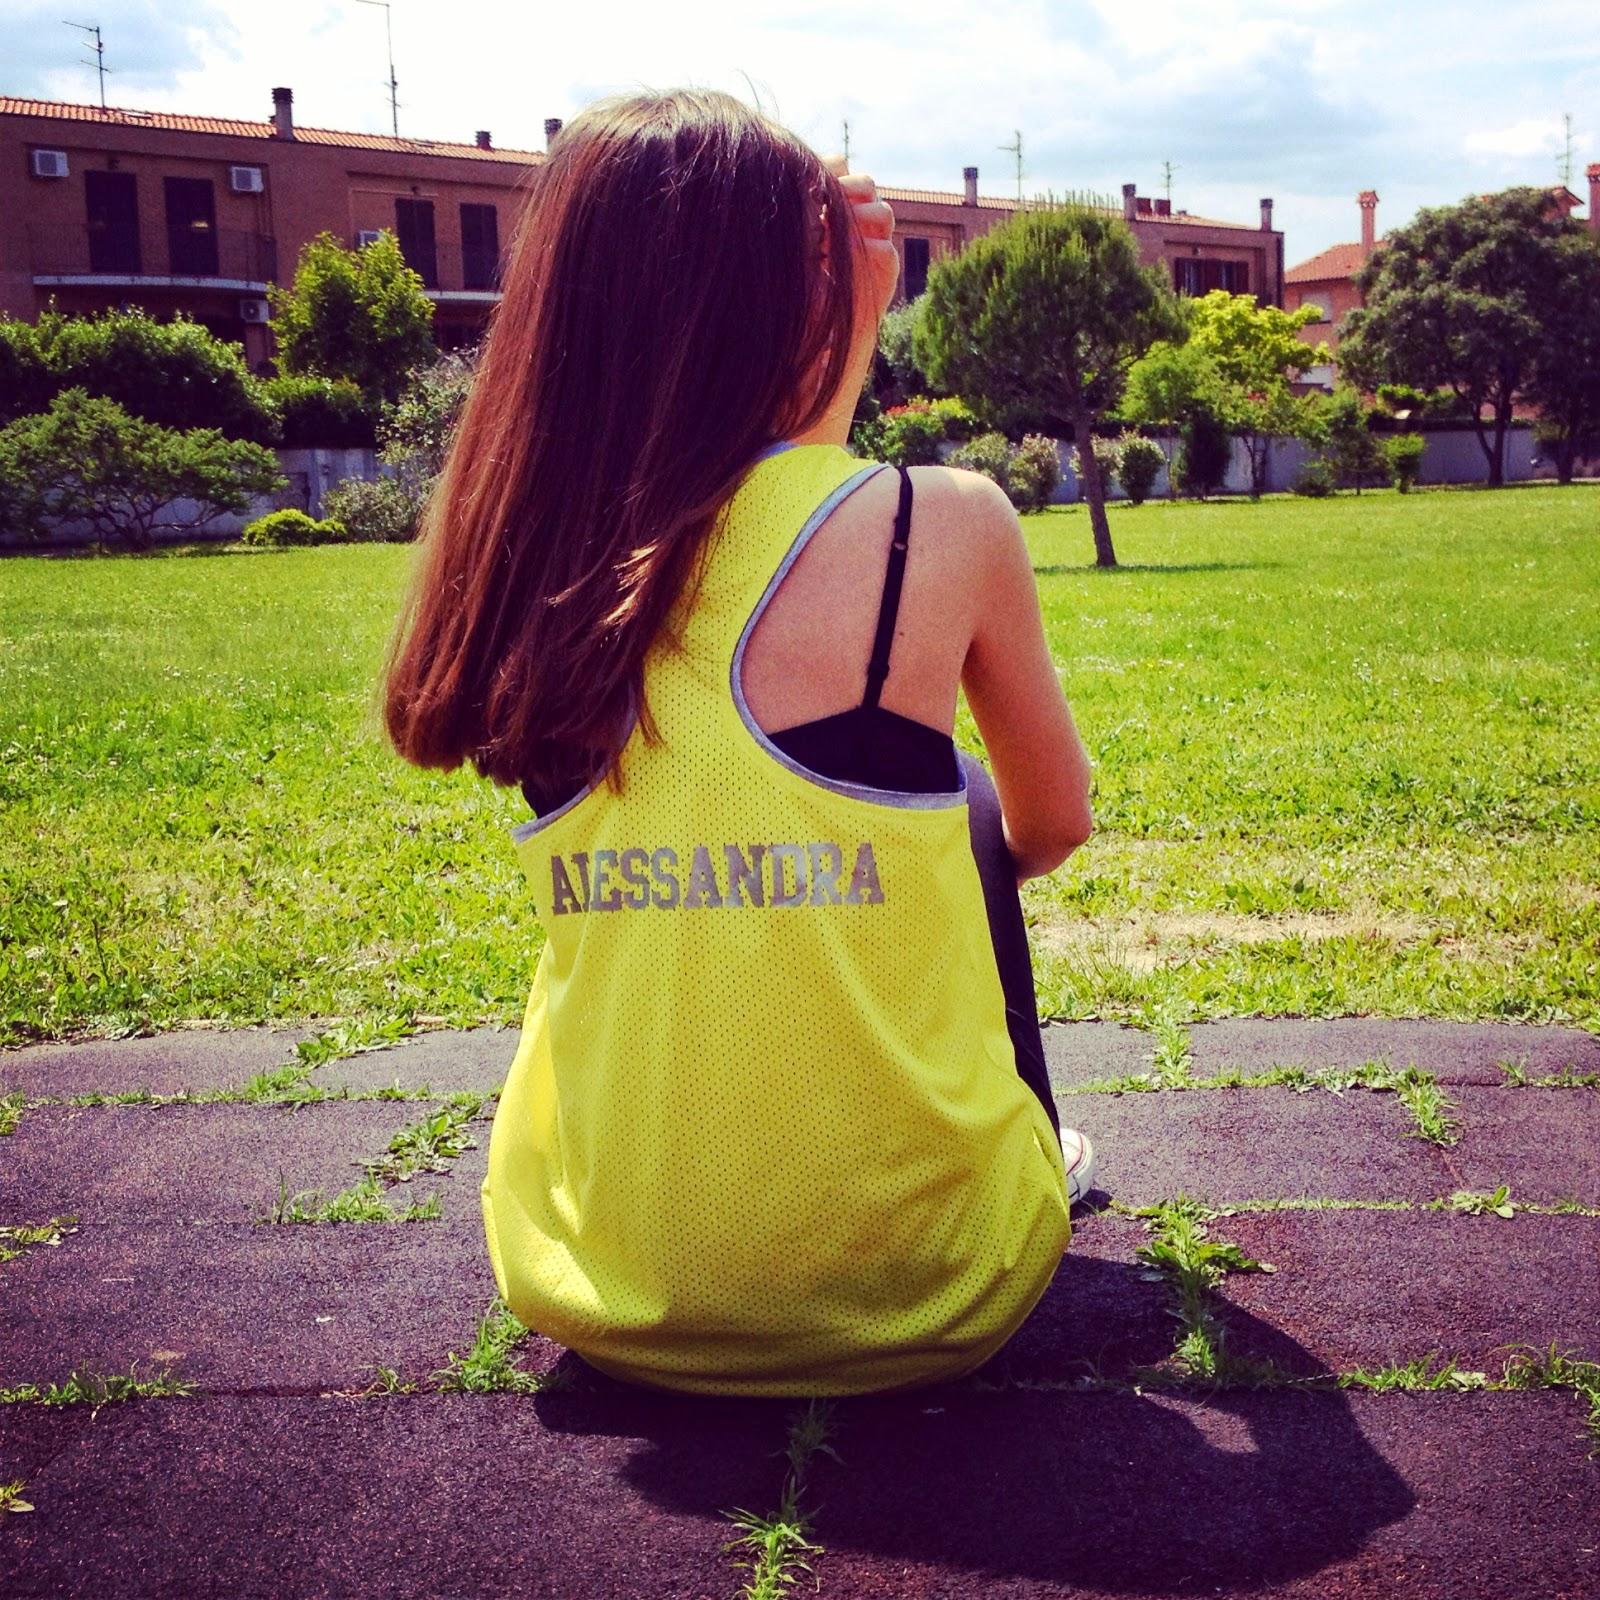 Alessandra 39 s fashion la mia canotta personalizzata di for La mia casa personalizzata